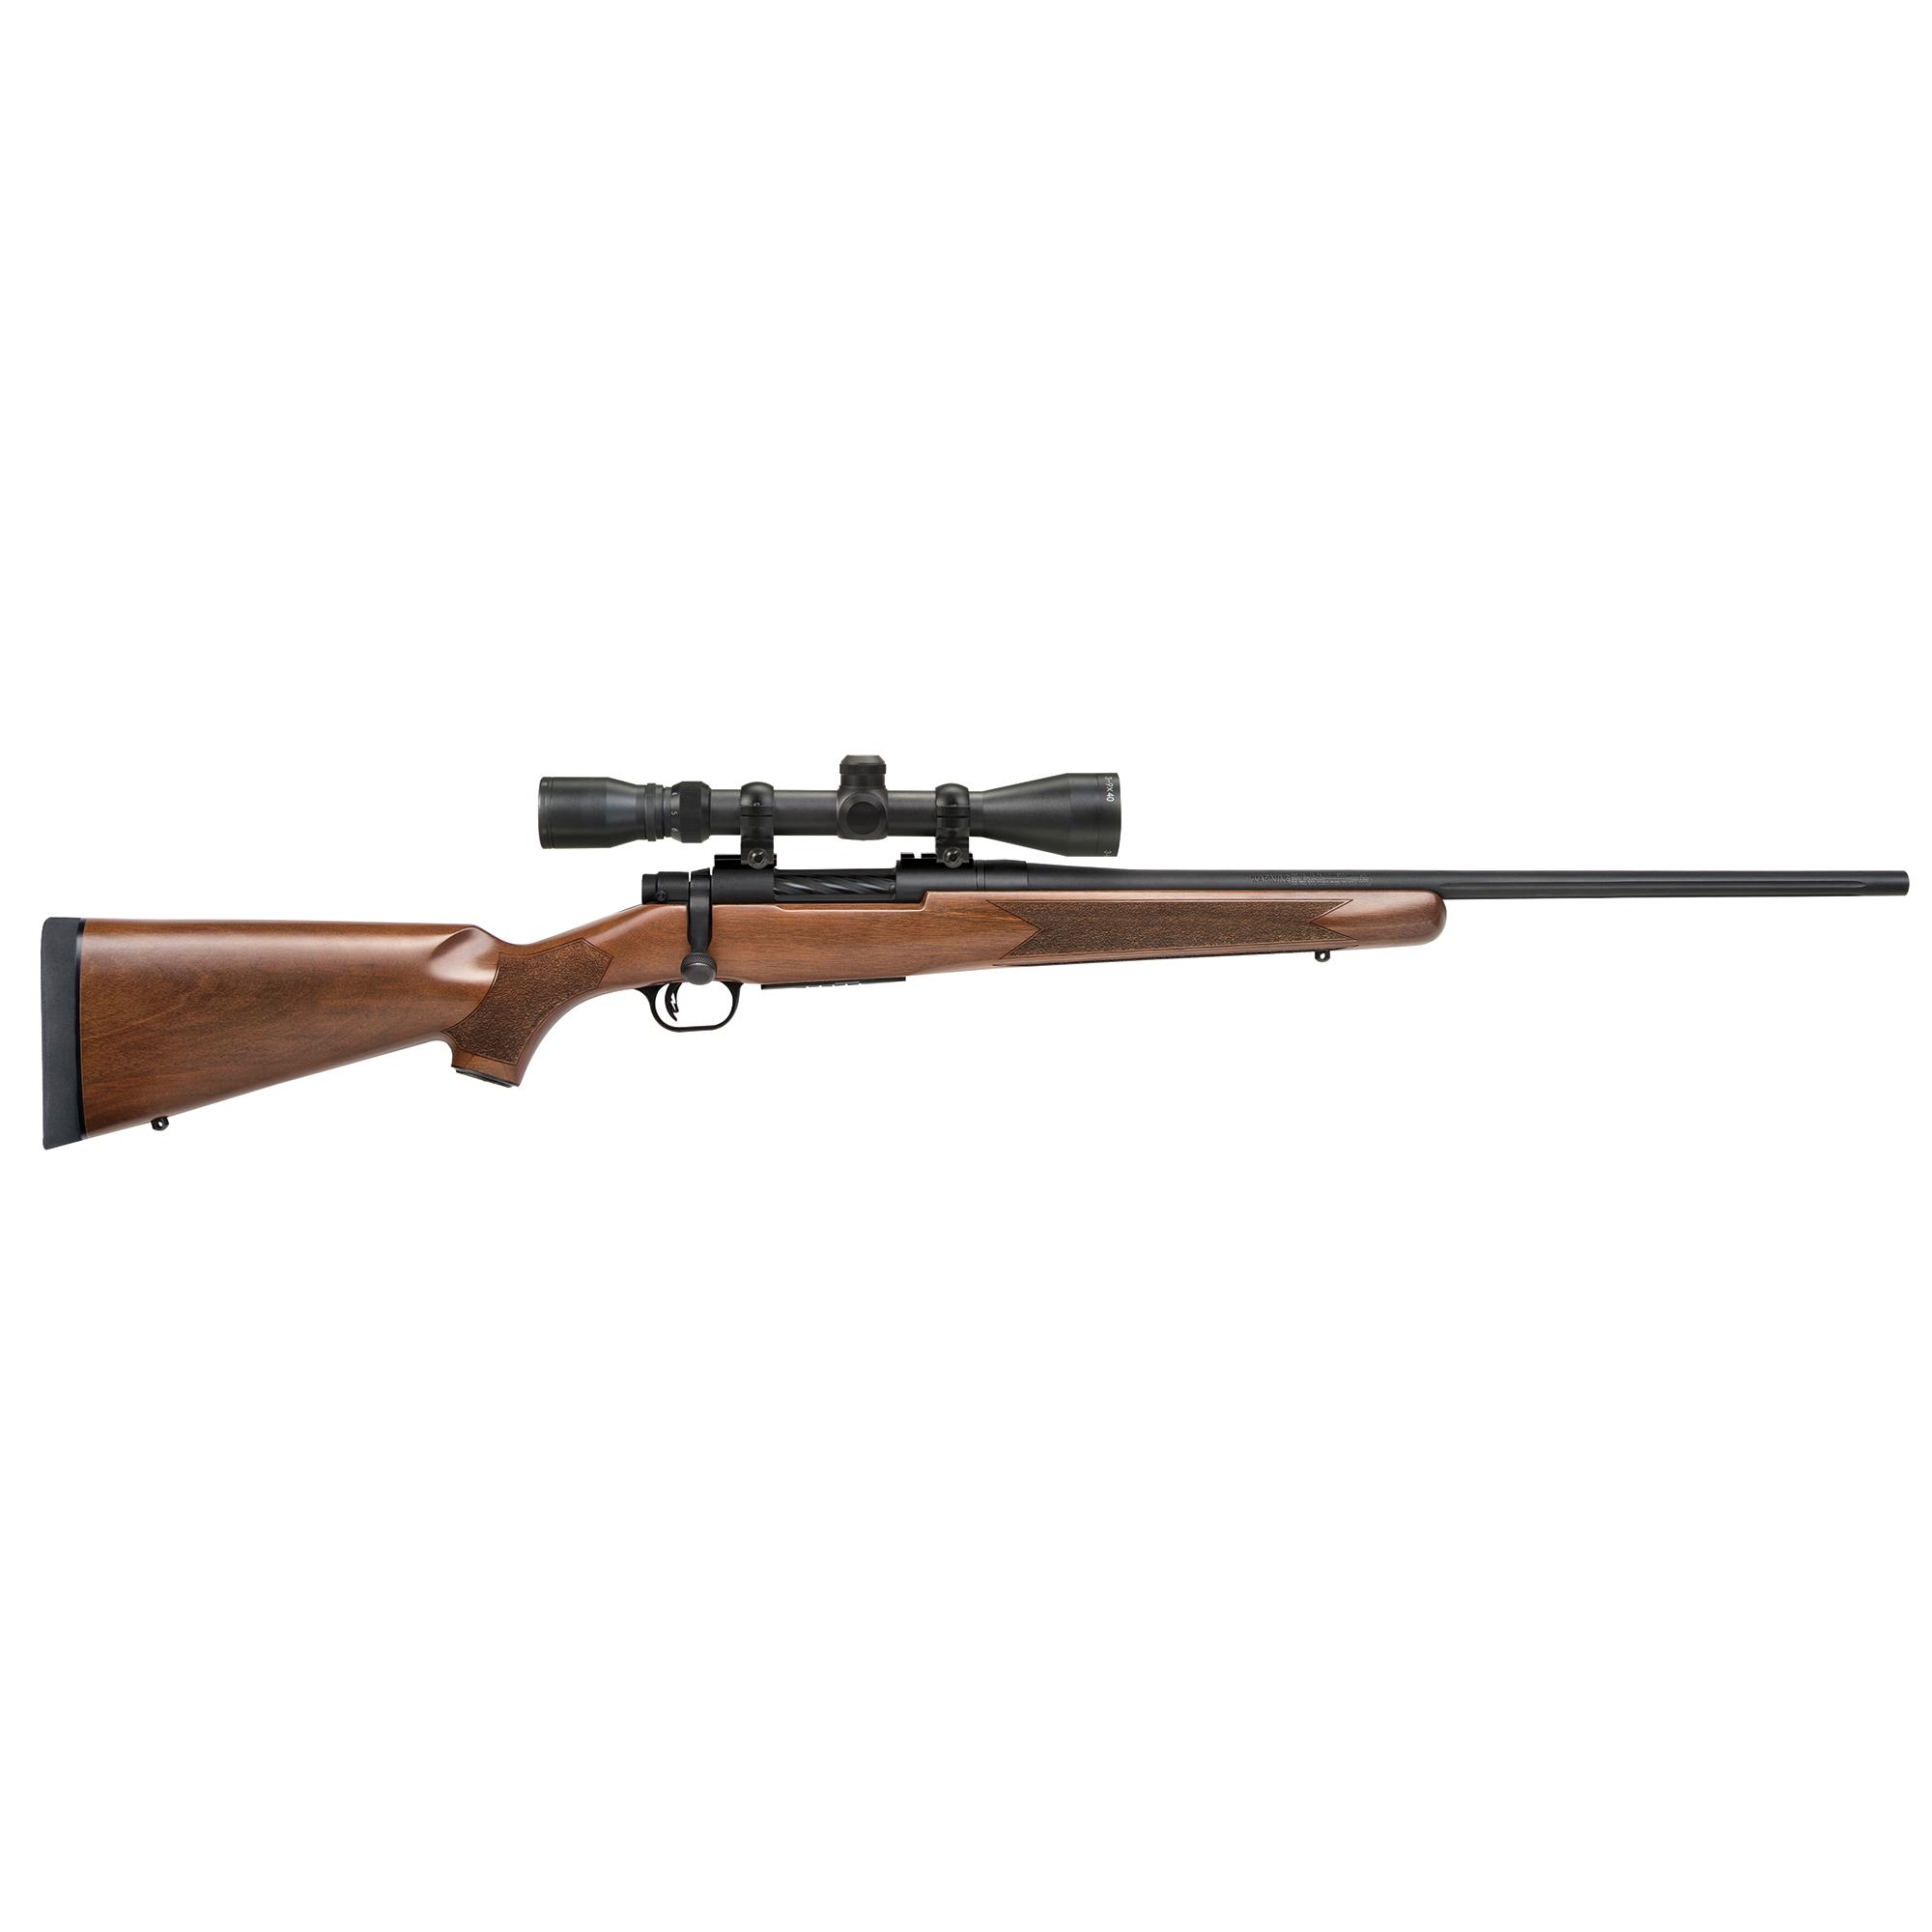 Mossberg Patriot Walnut Centerfire Rifle Package, .22-250 Rem., Walnut